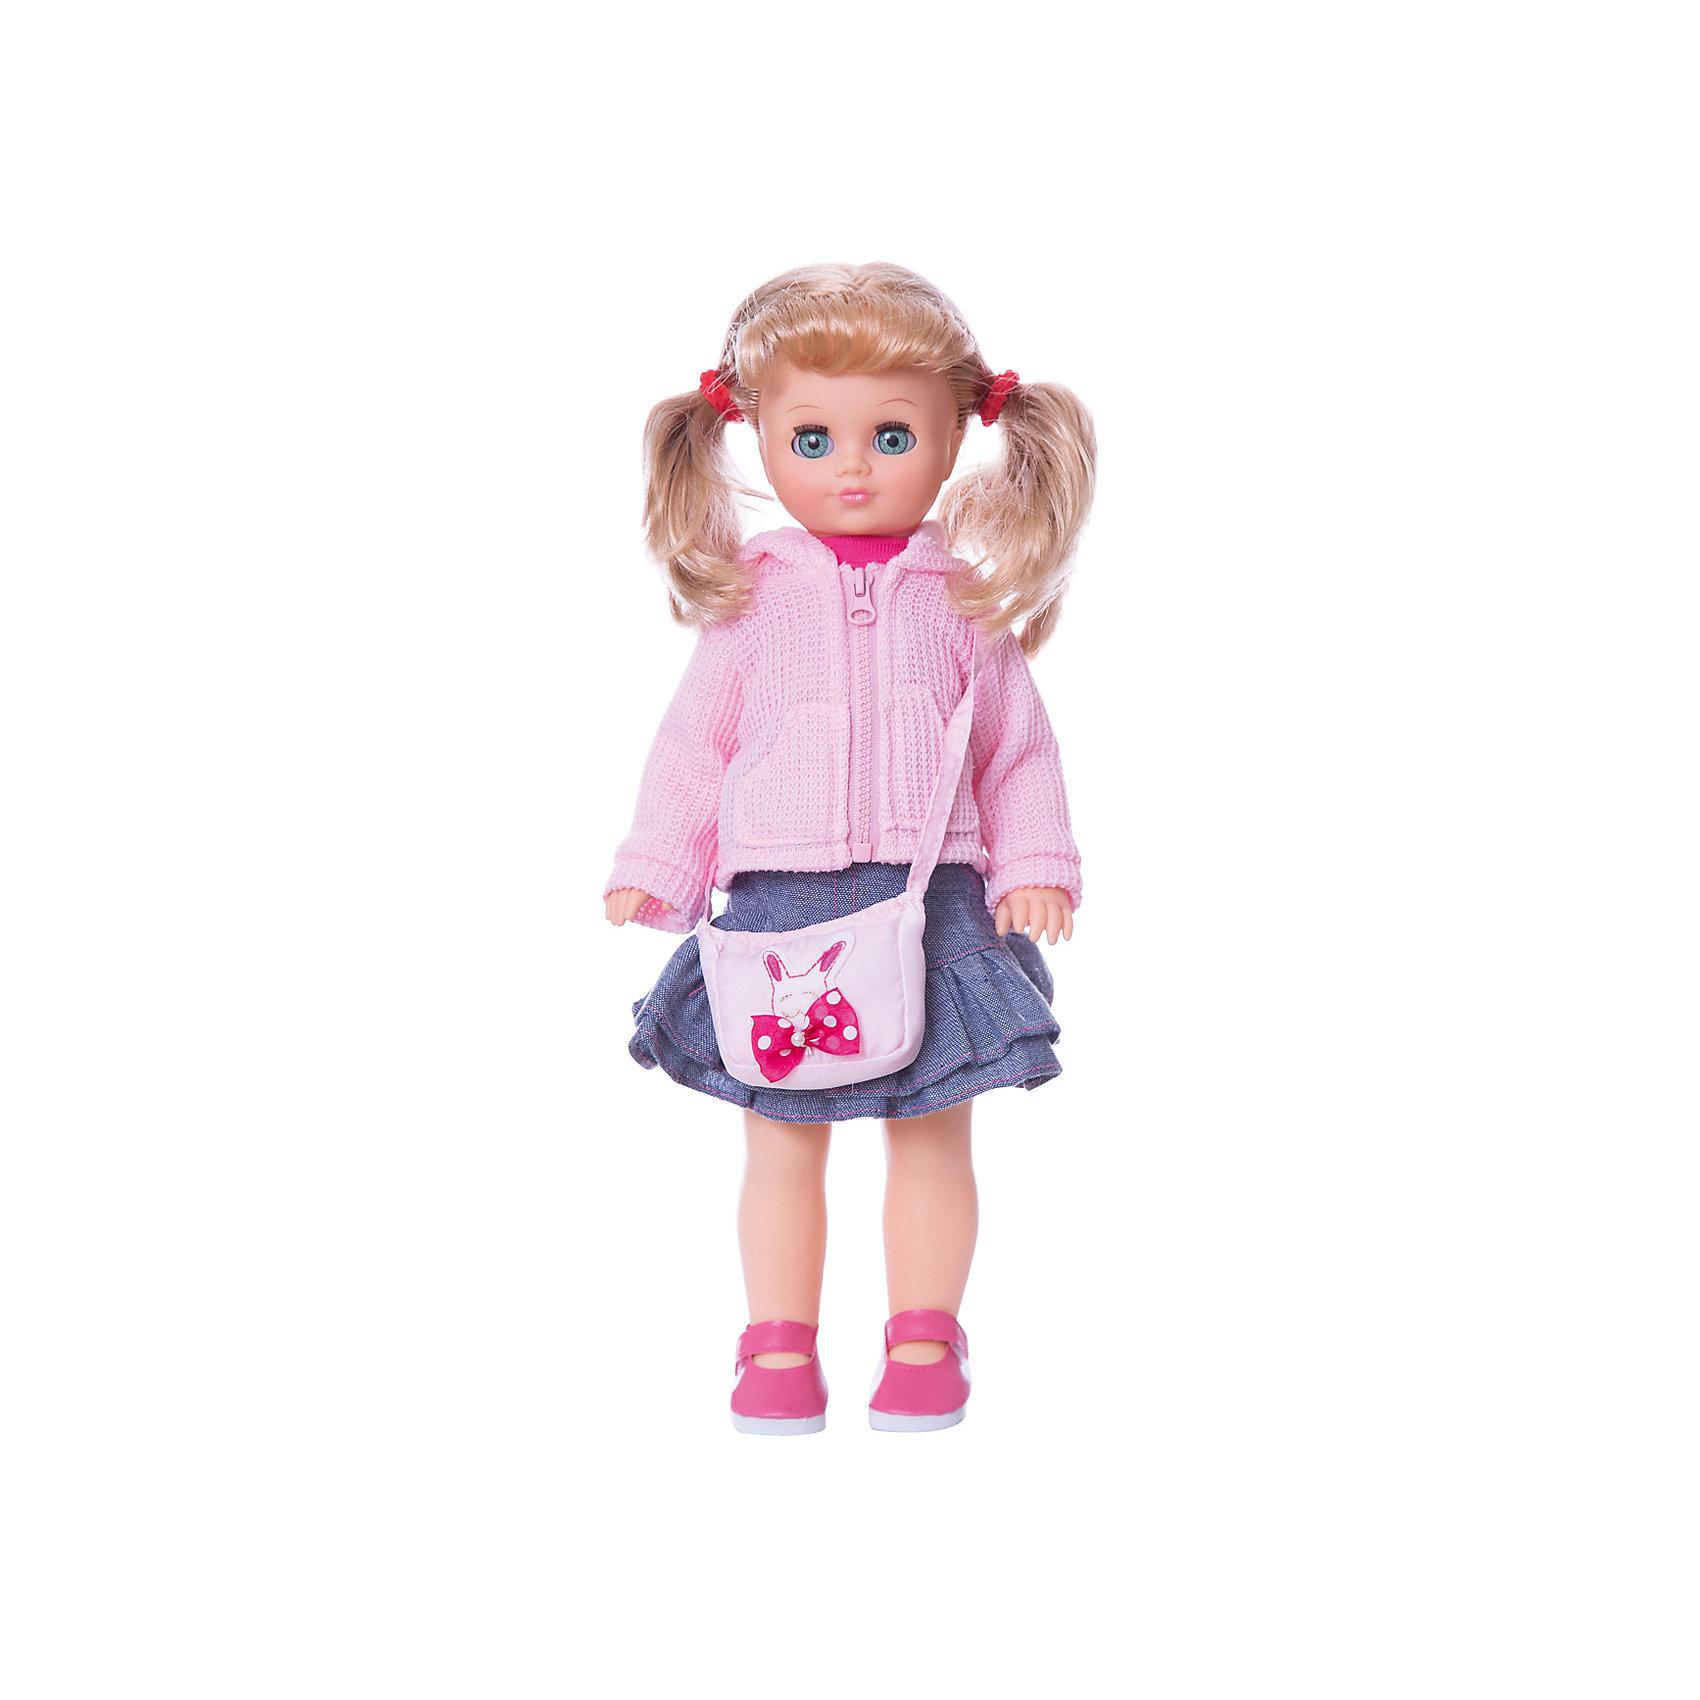 Весна Кукла Лиза 18, со звуком, Весна кукла весна алсу 35 см со звуком в1634 о